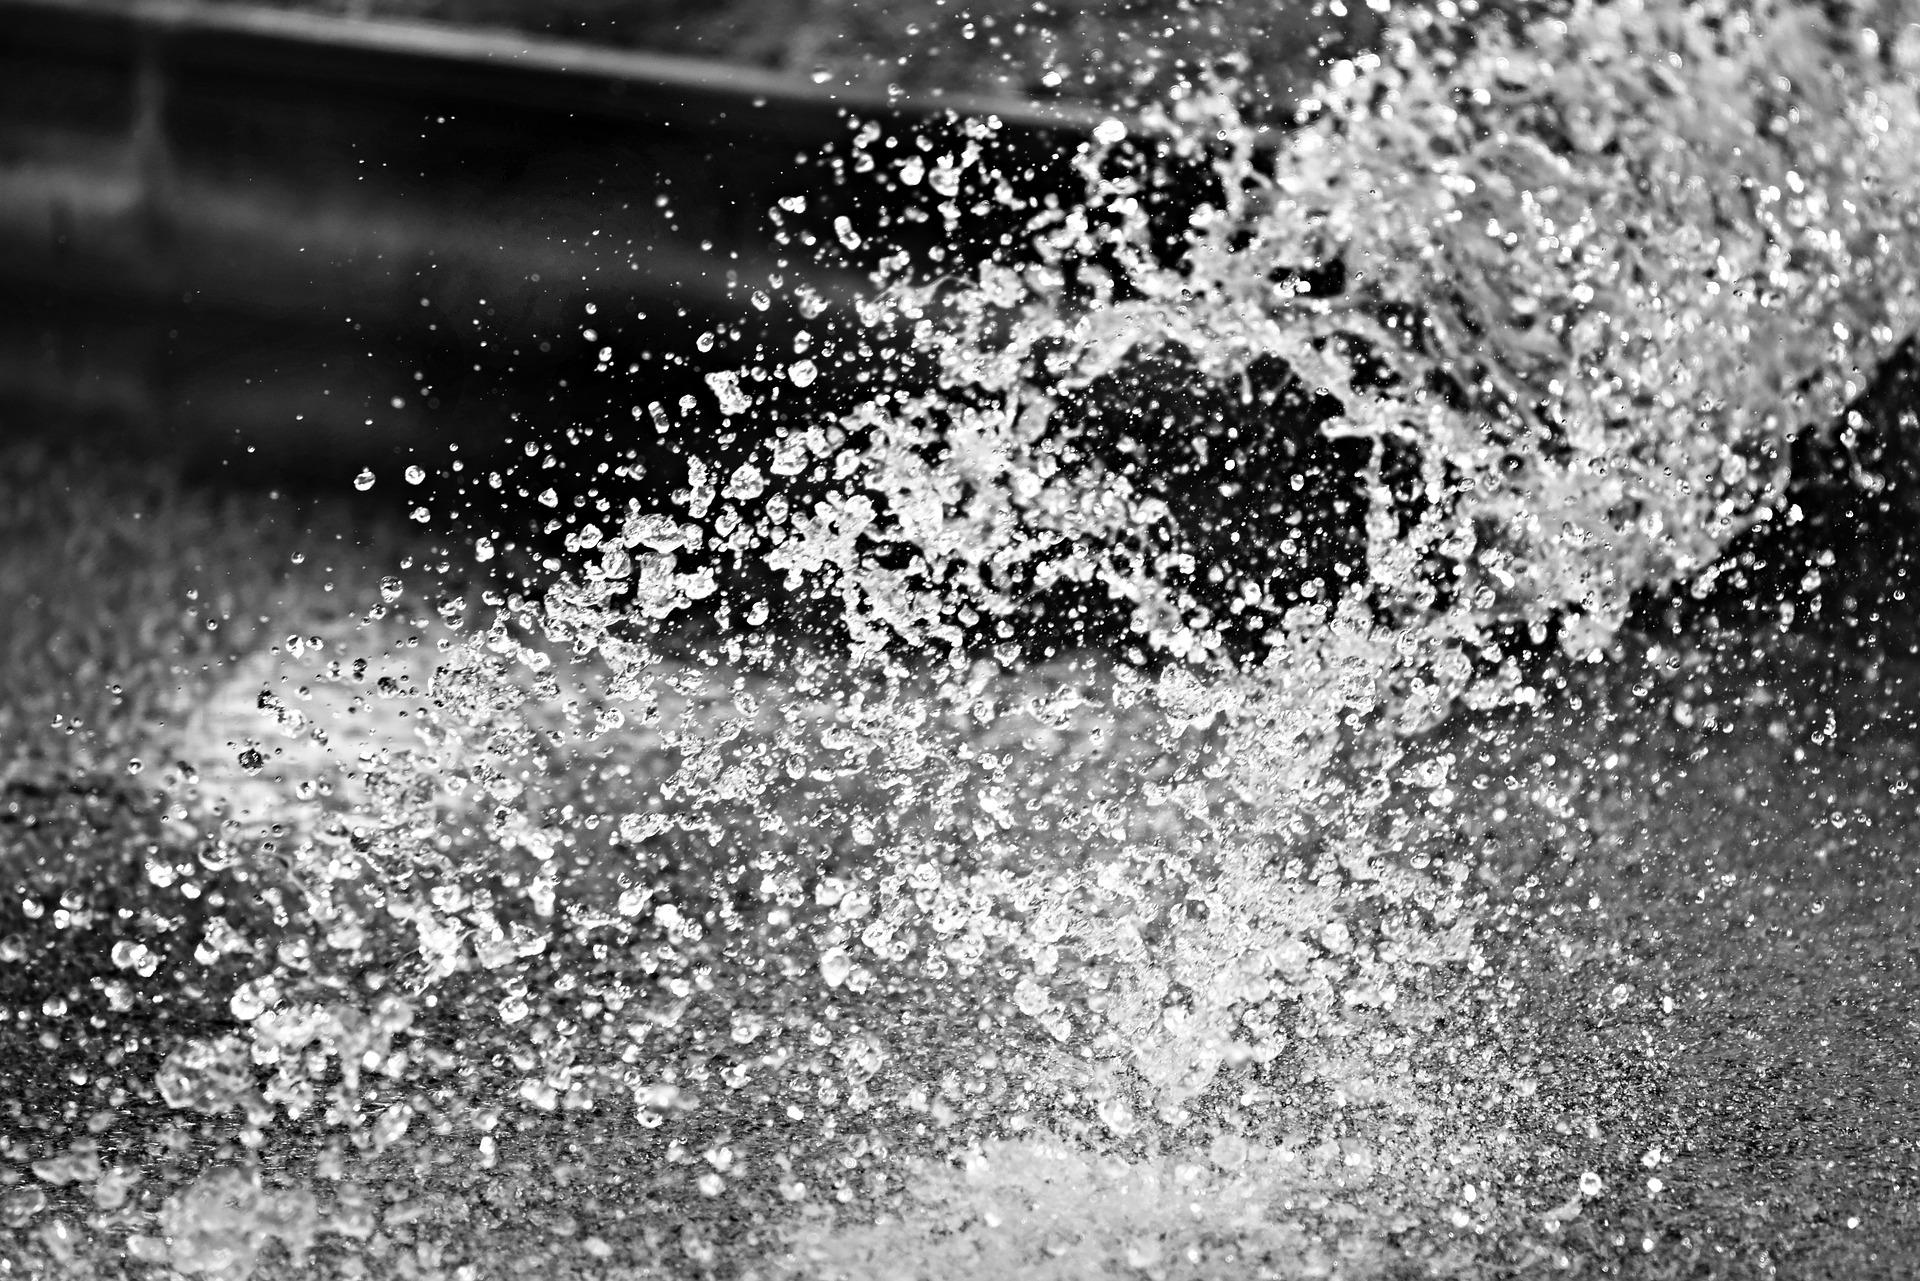 water splatter